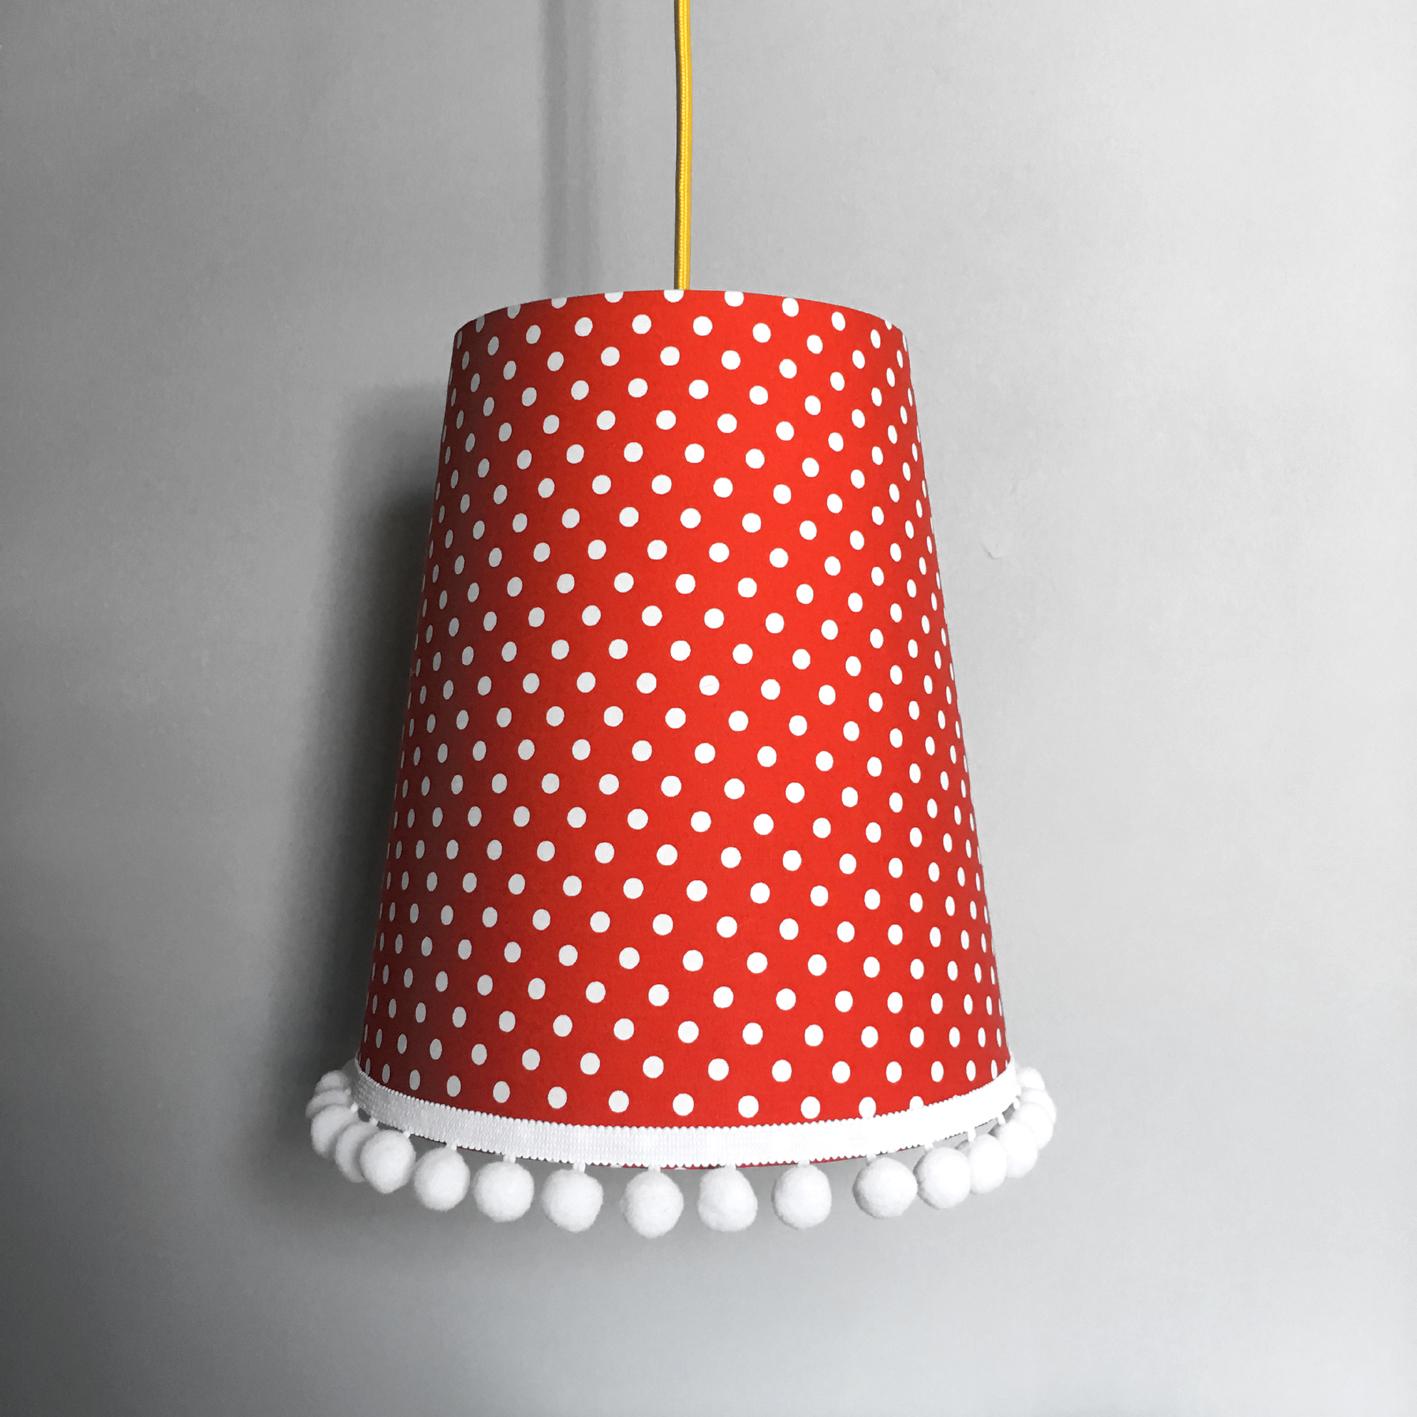 Pom Pom Lampshade In Mint Clown Stripes By Love Frankie